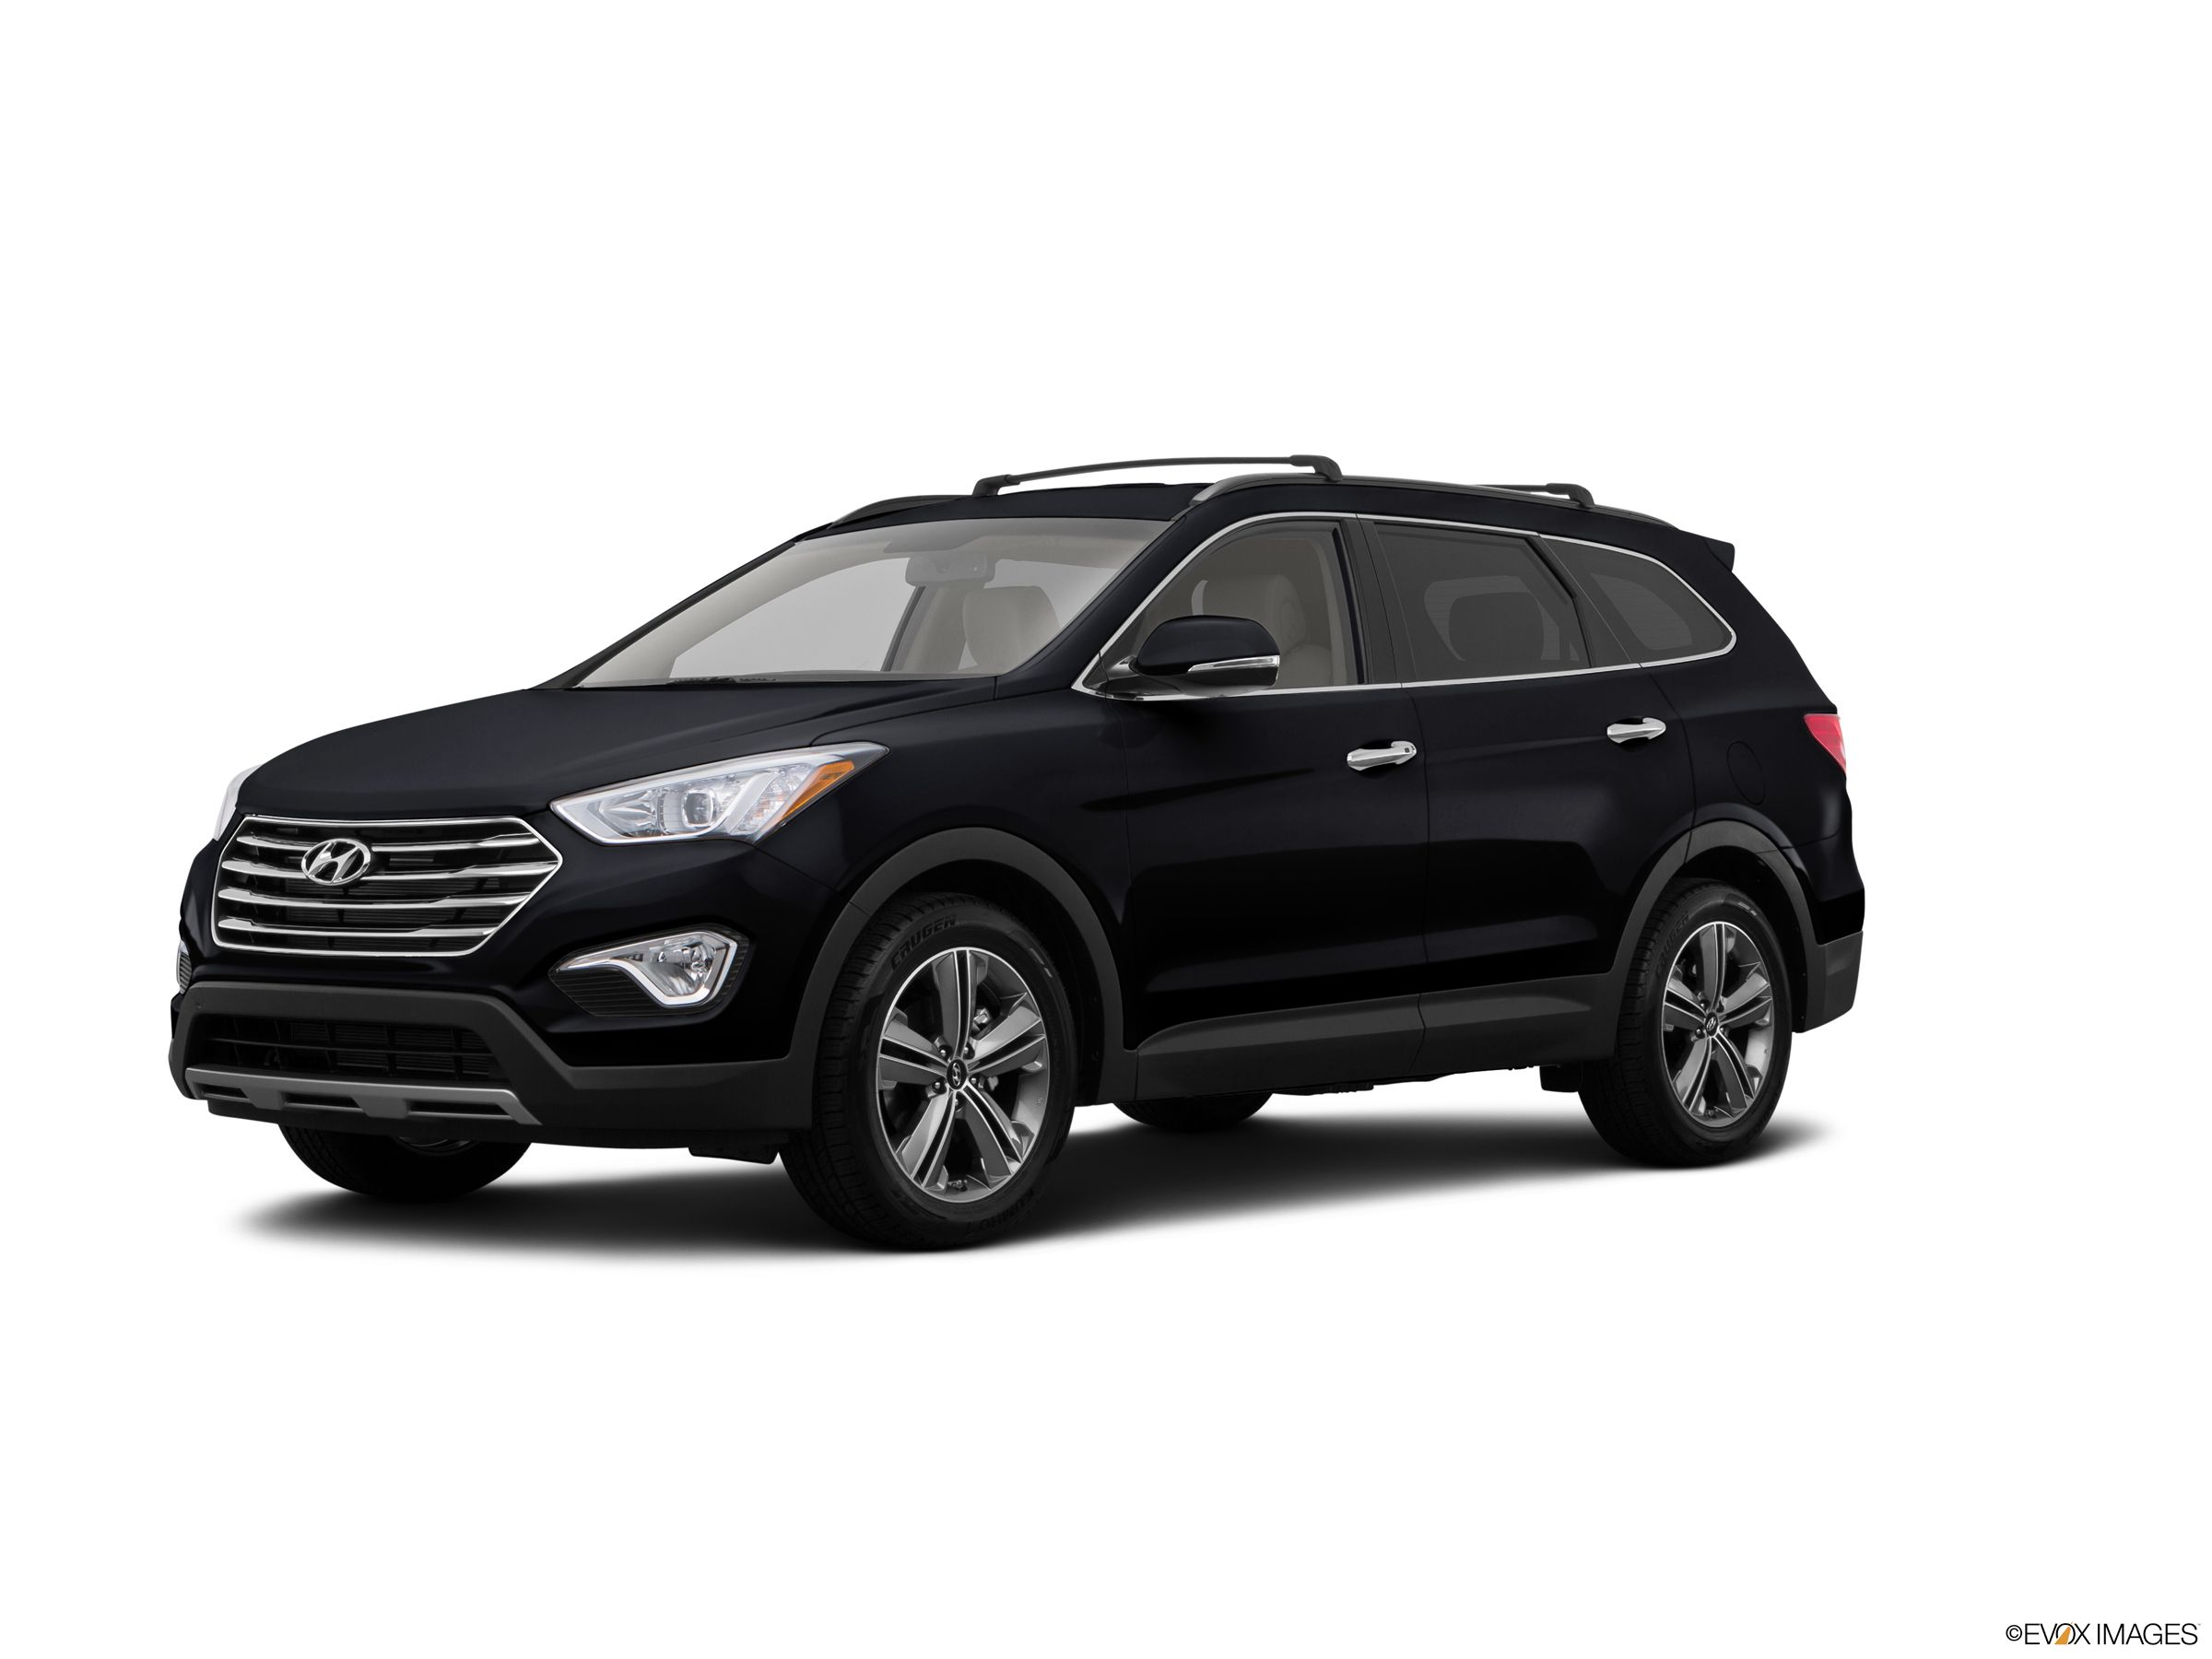 Crestmont Hyundai dealership in Brunswick, OH. New & Used